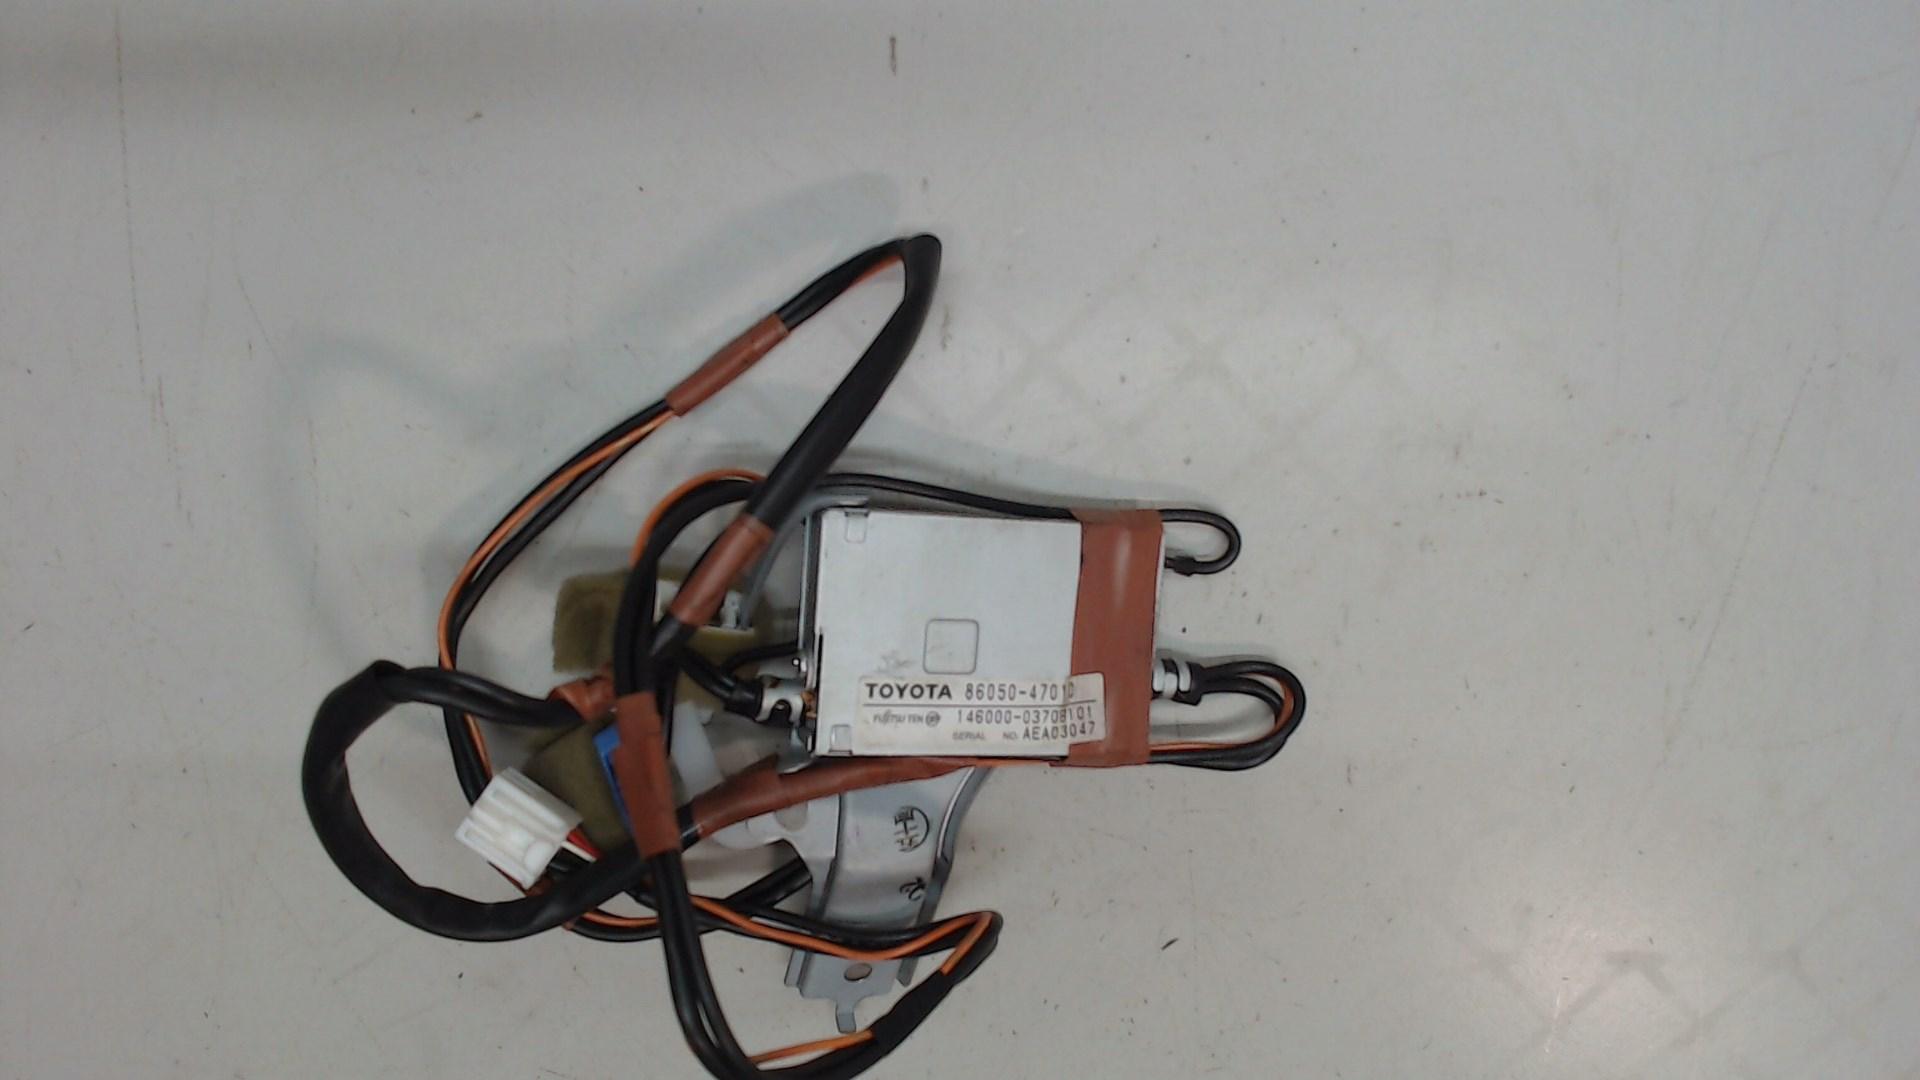 Антенна  Toyota  86050-47010